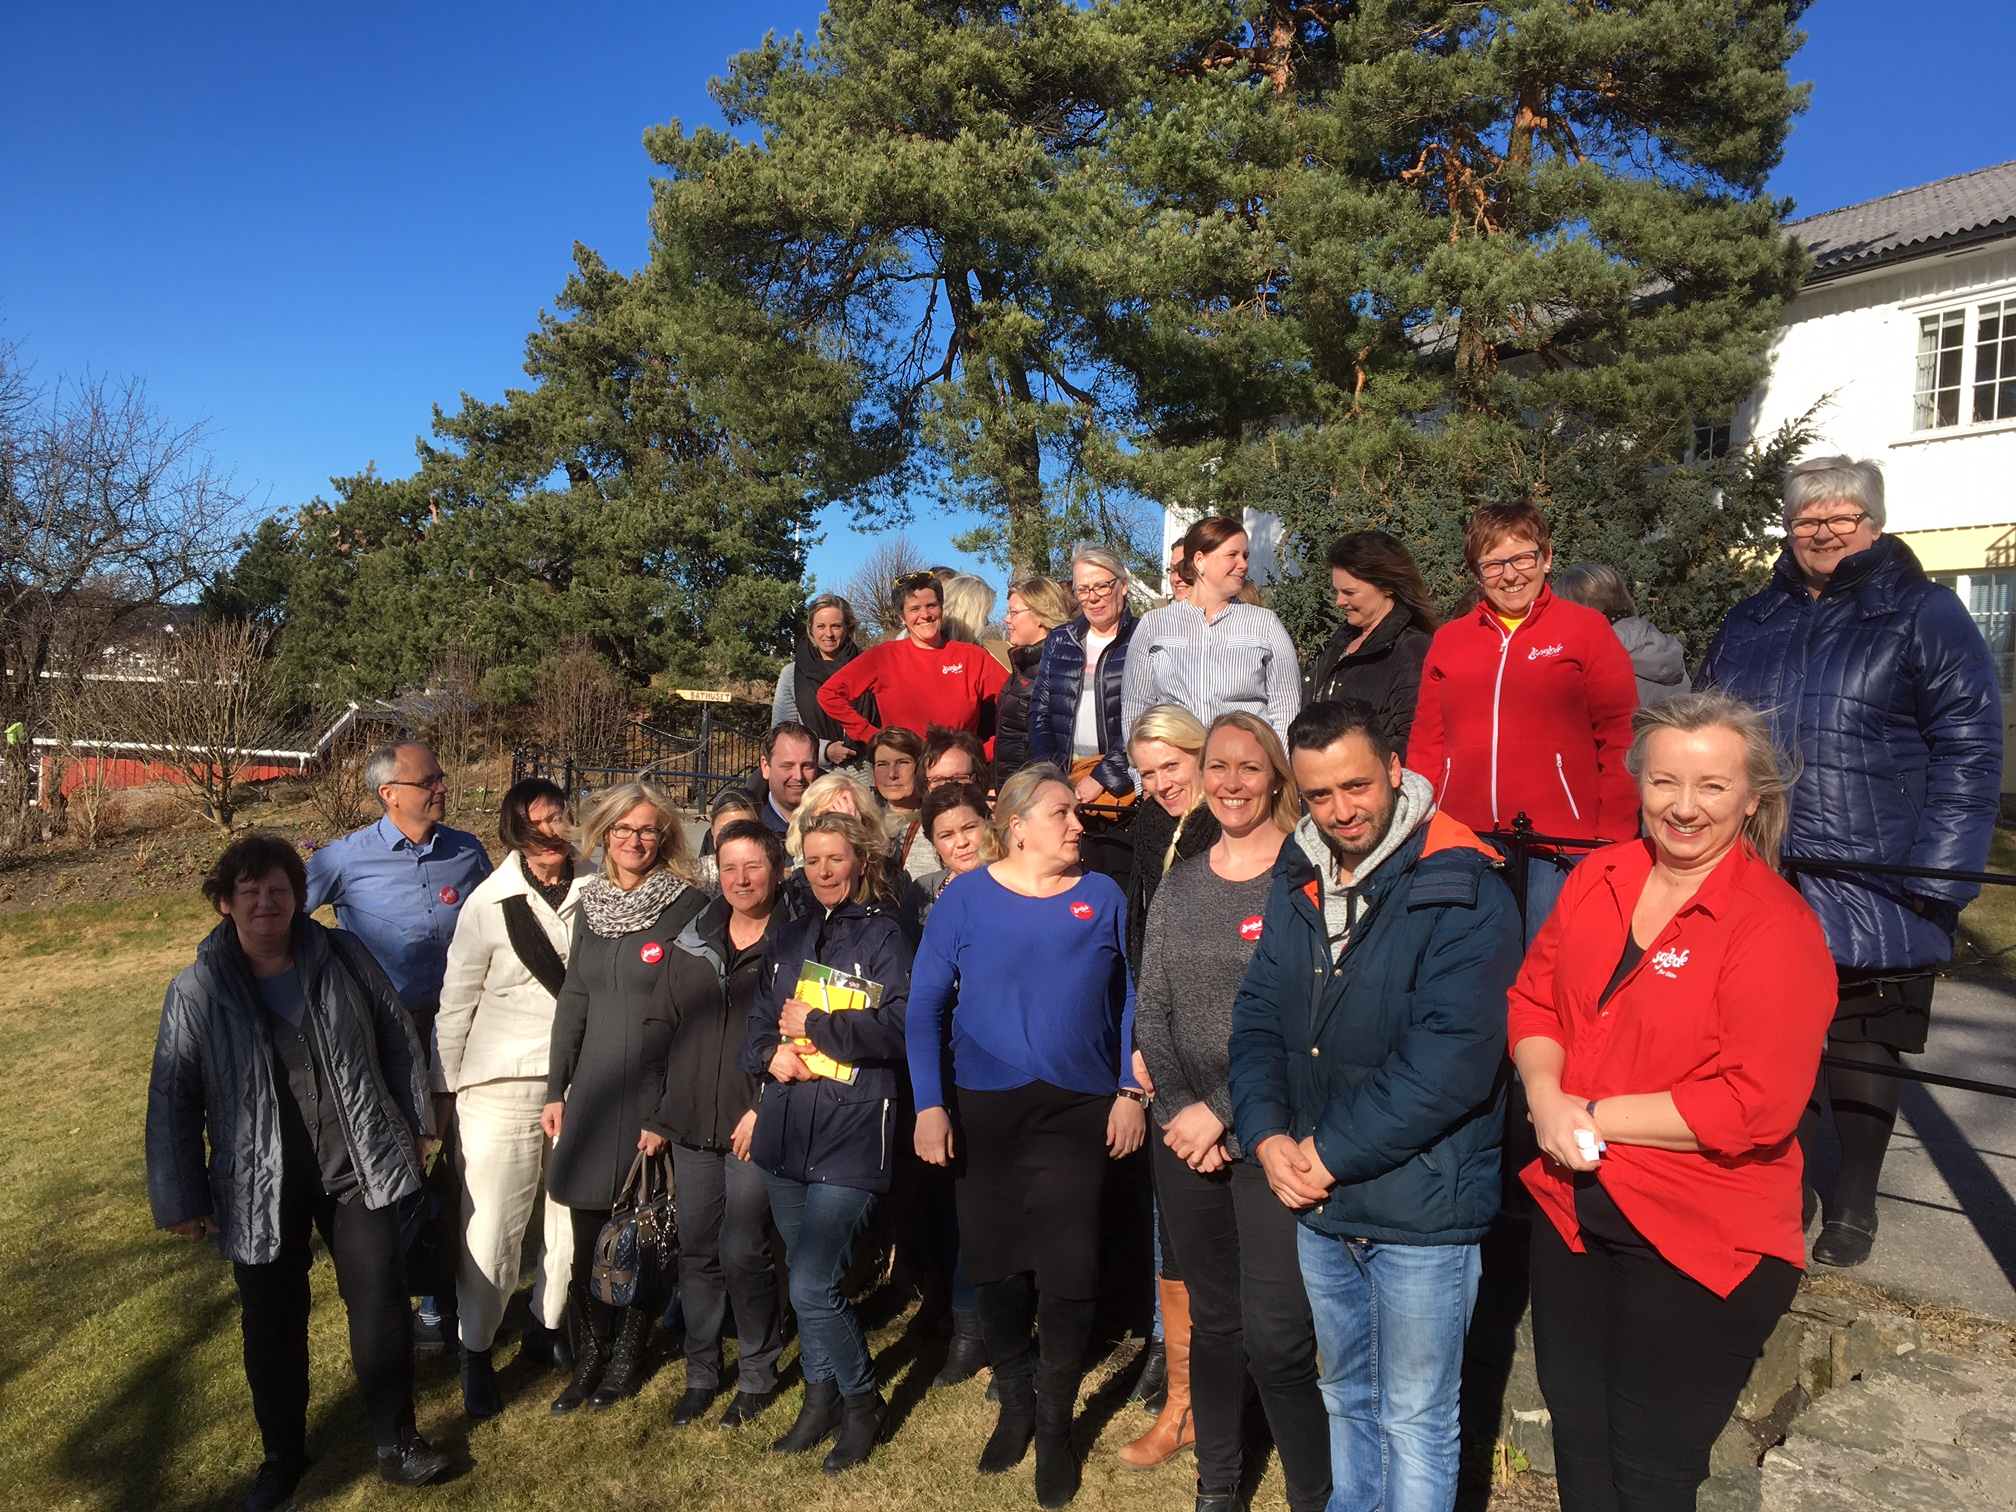 Entusiastiske ansatte fra Saltrød bo- og omsorgssenter i Arendal